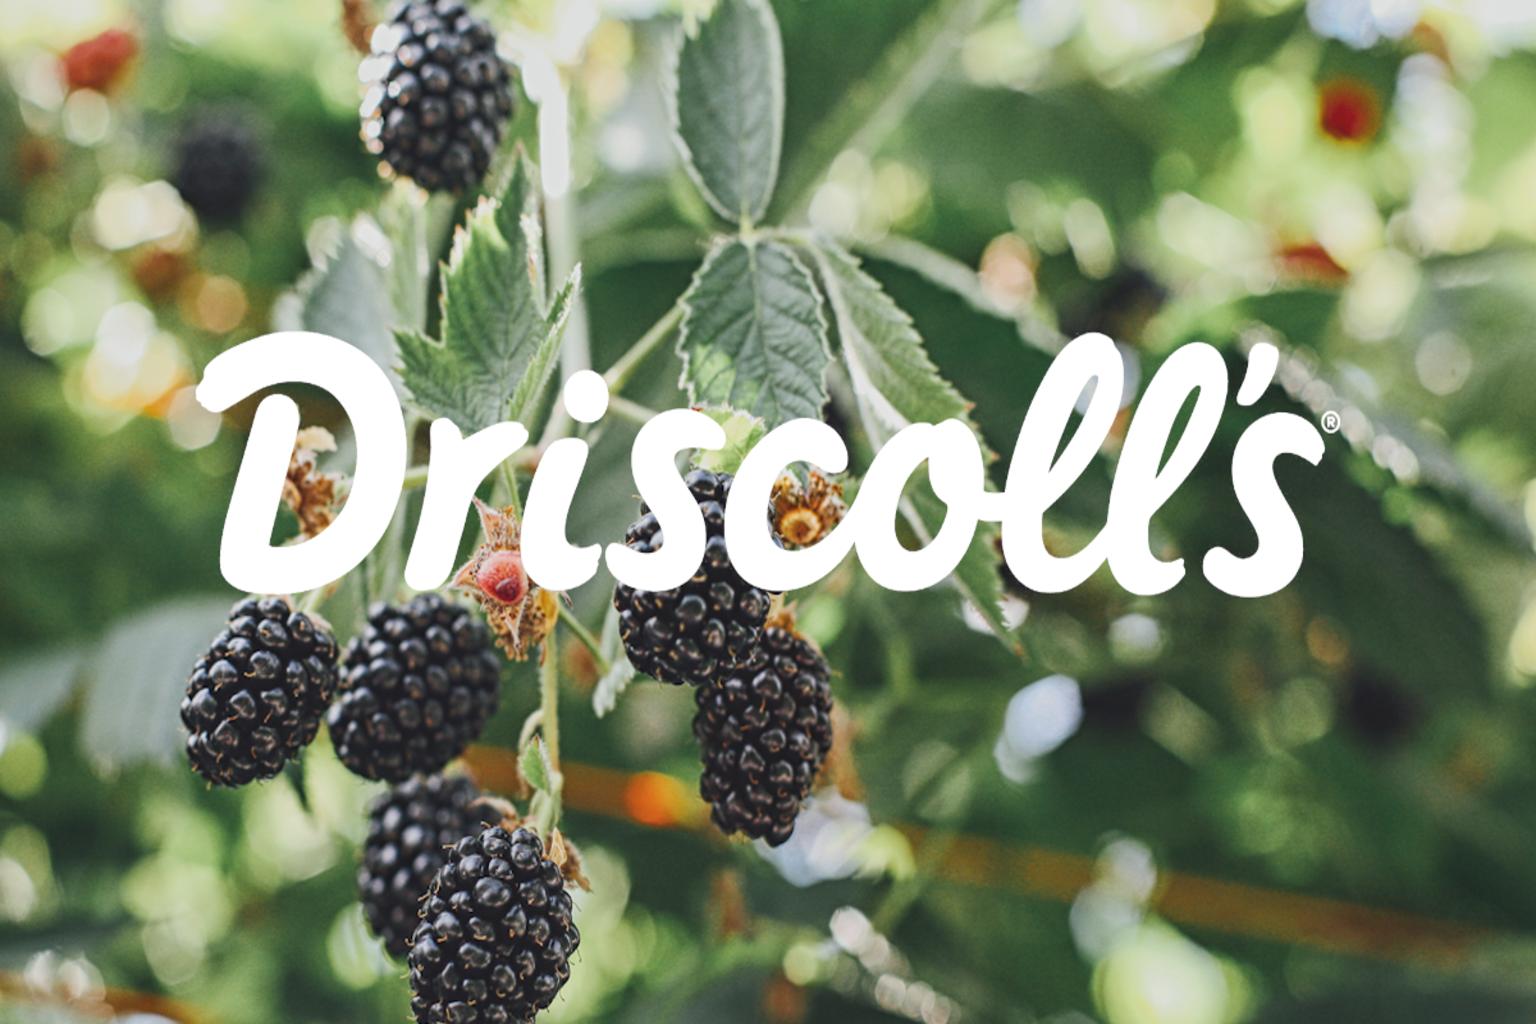 driscolls-fast-close-aihub-cch-tagetik-thumbnail